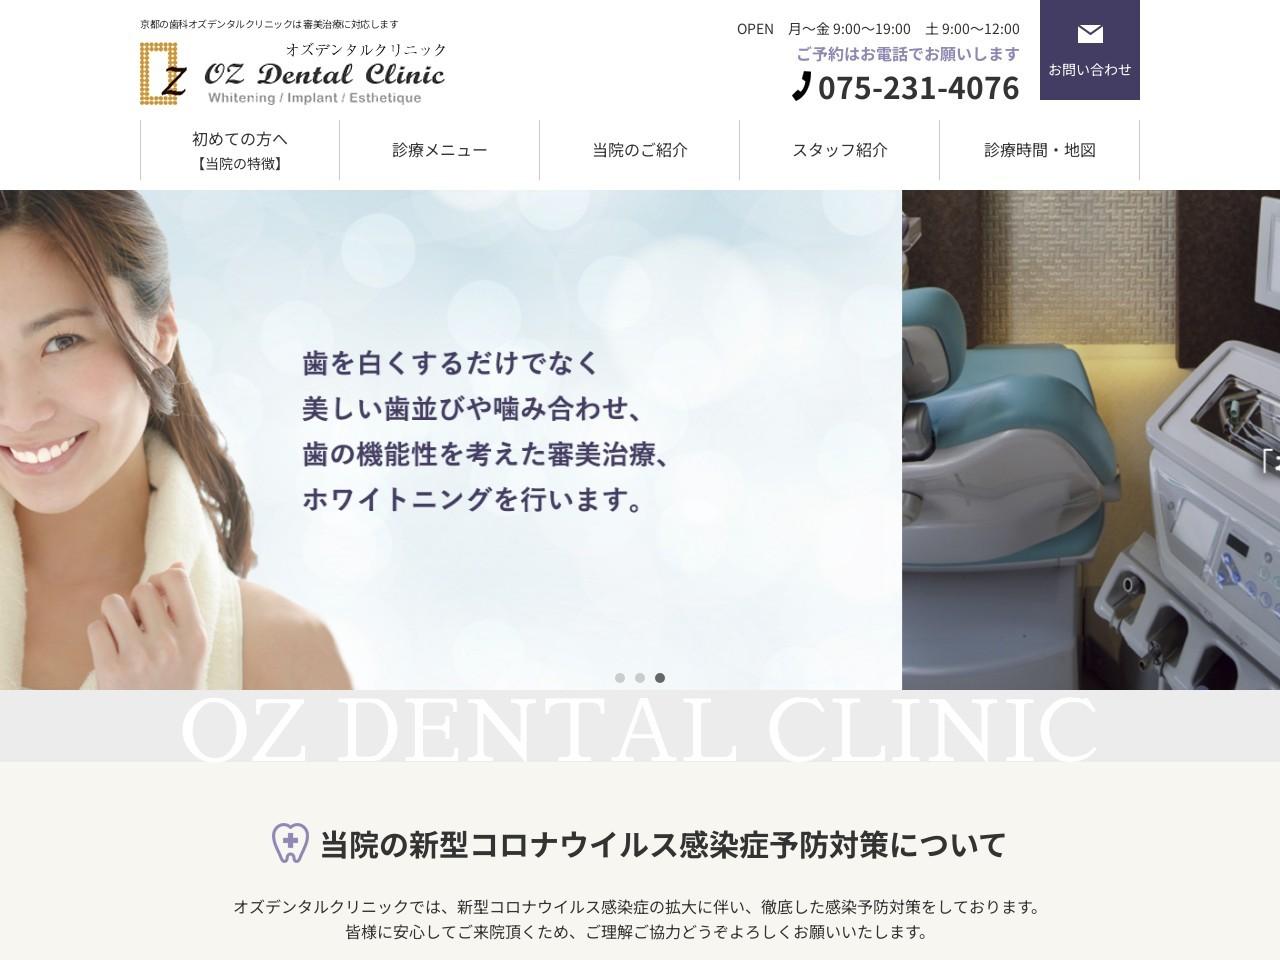 OZ Dental Clinic (京都府京都市中京区)